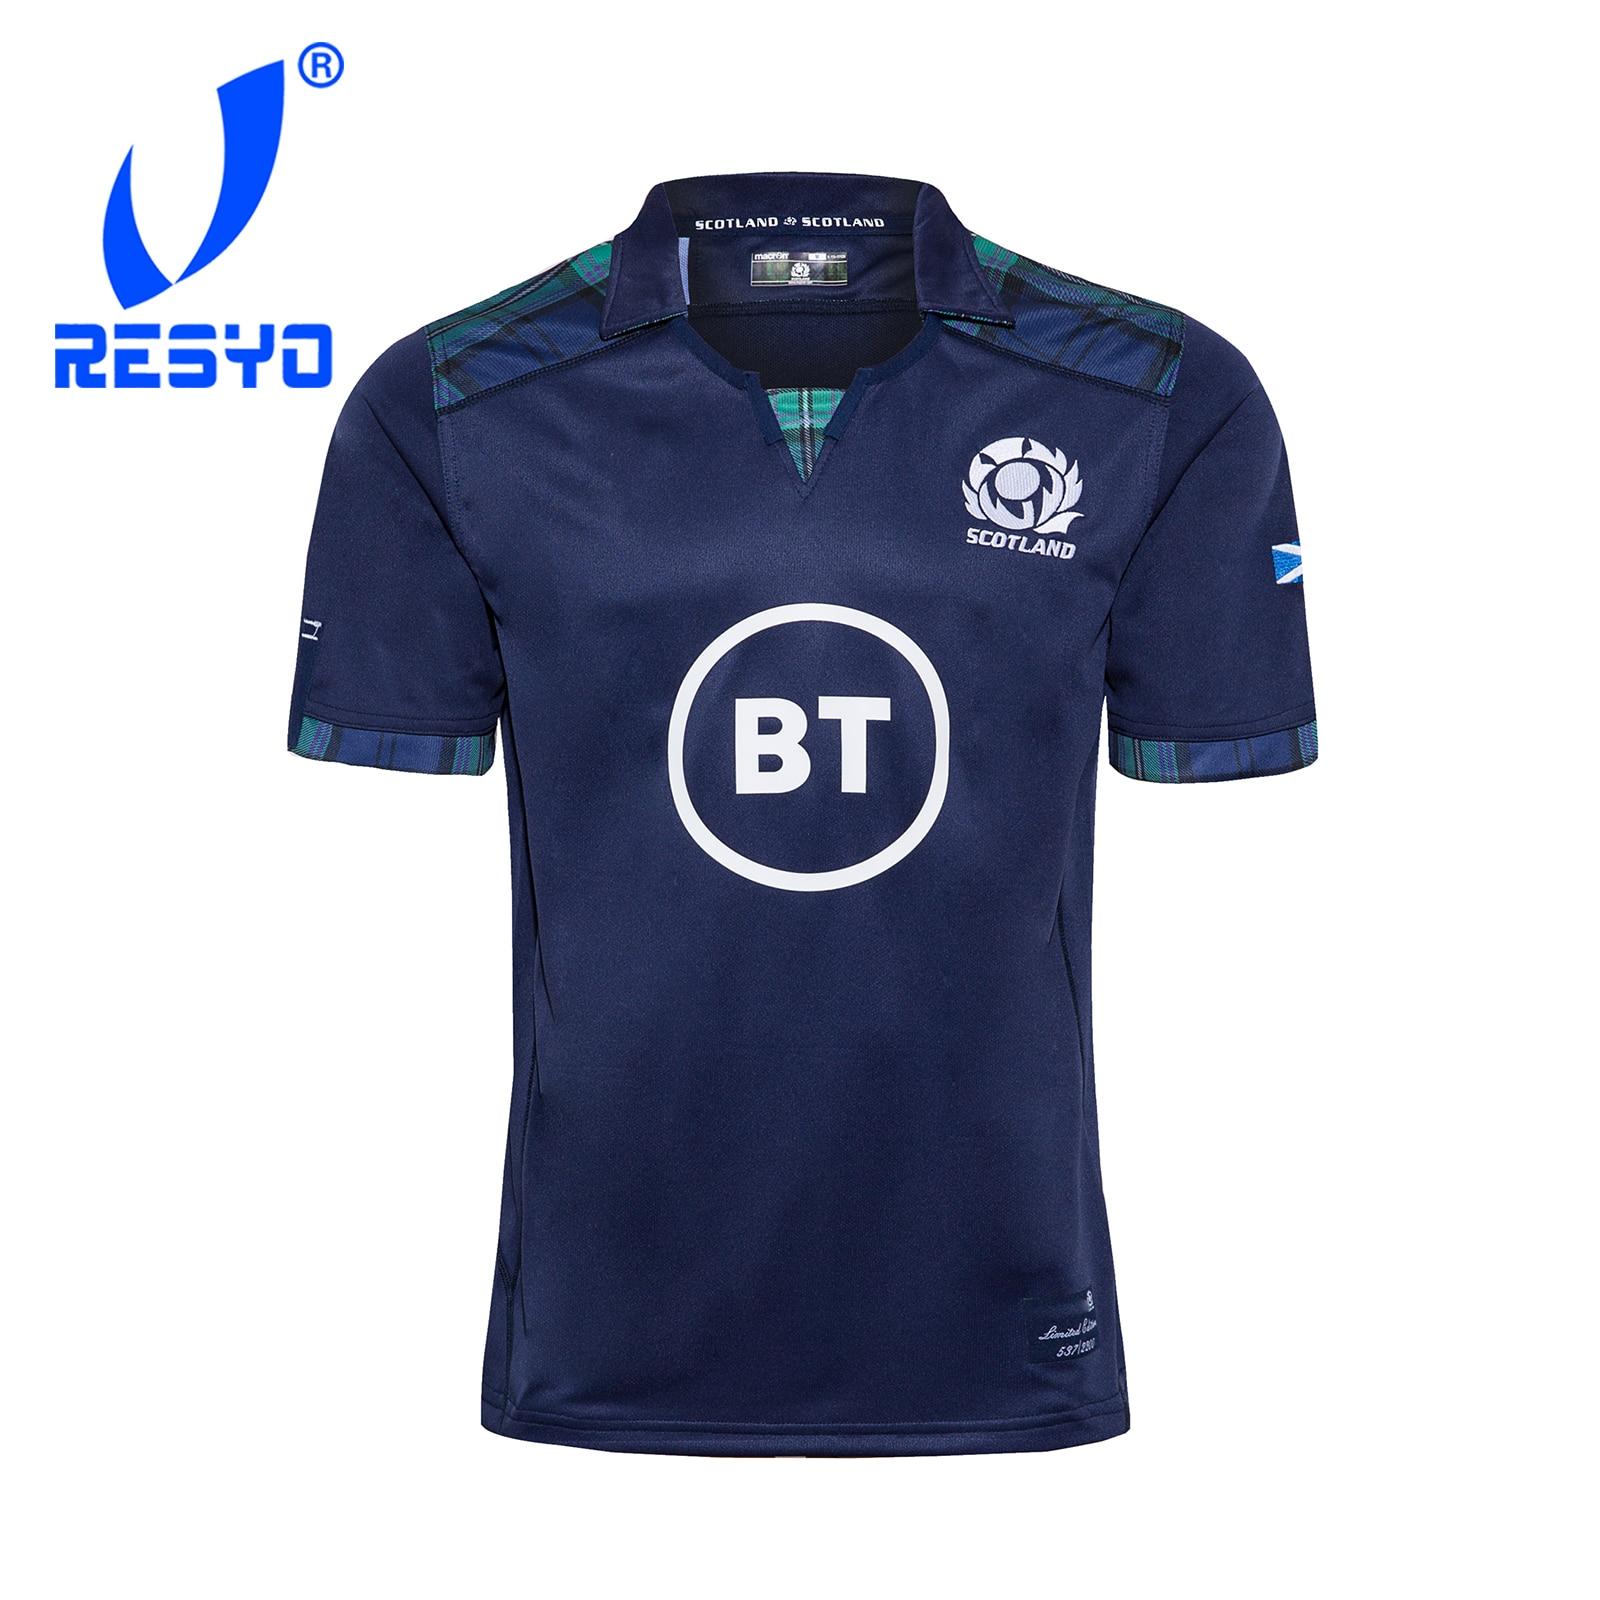 RESYO para Escocia 2019/2020 casa PRO RUGBY JERSEY camisa de deporte S-5XL